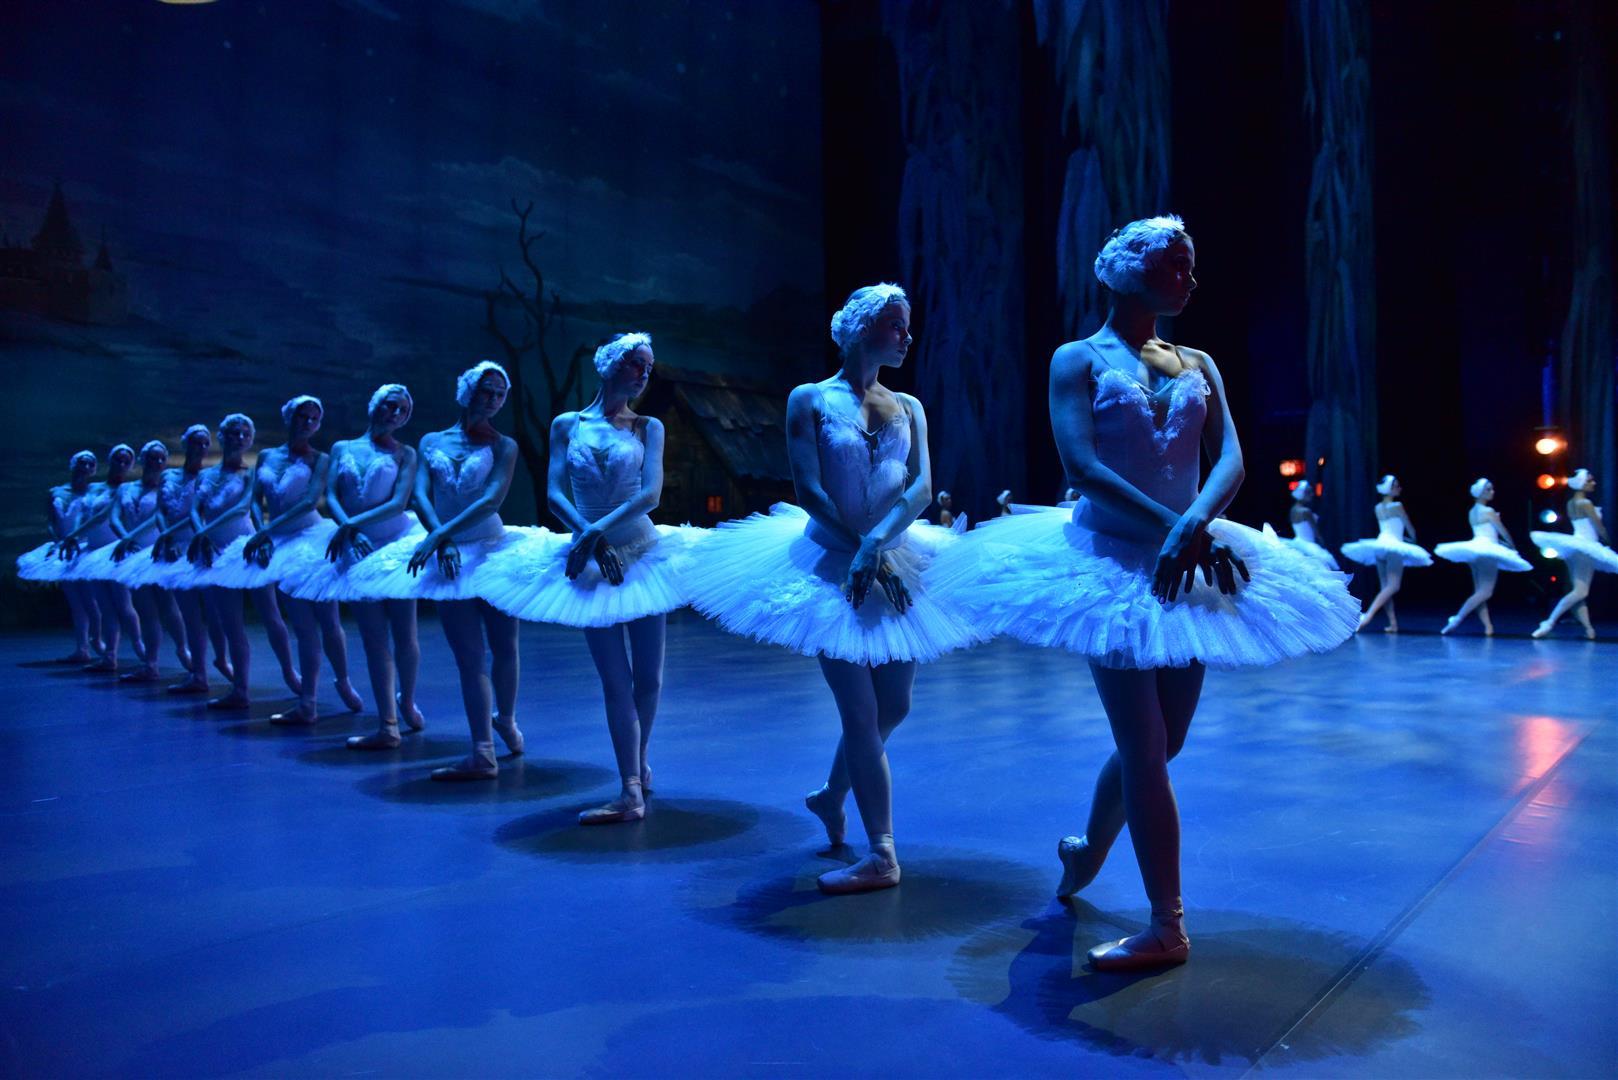 Dižais balets